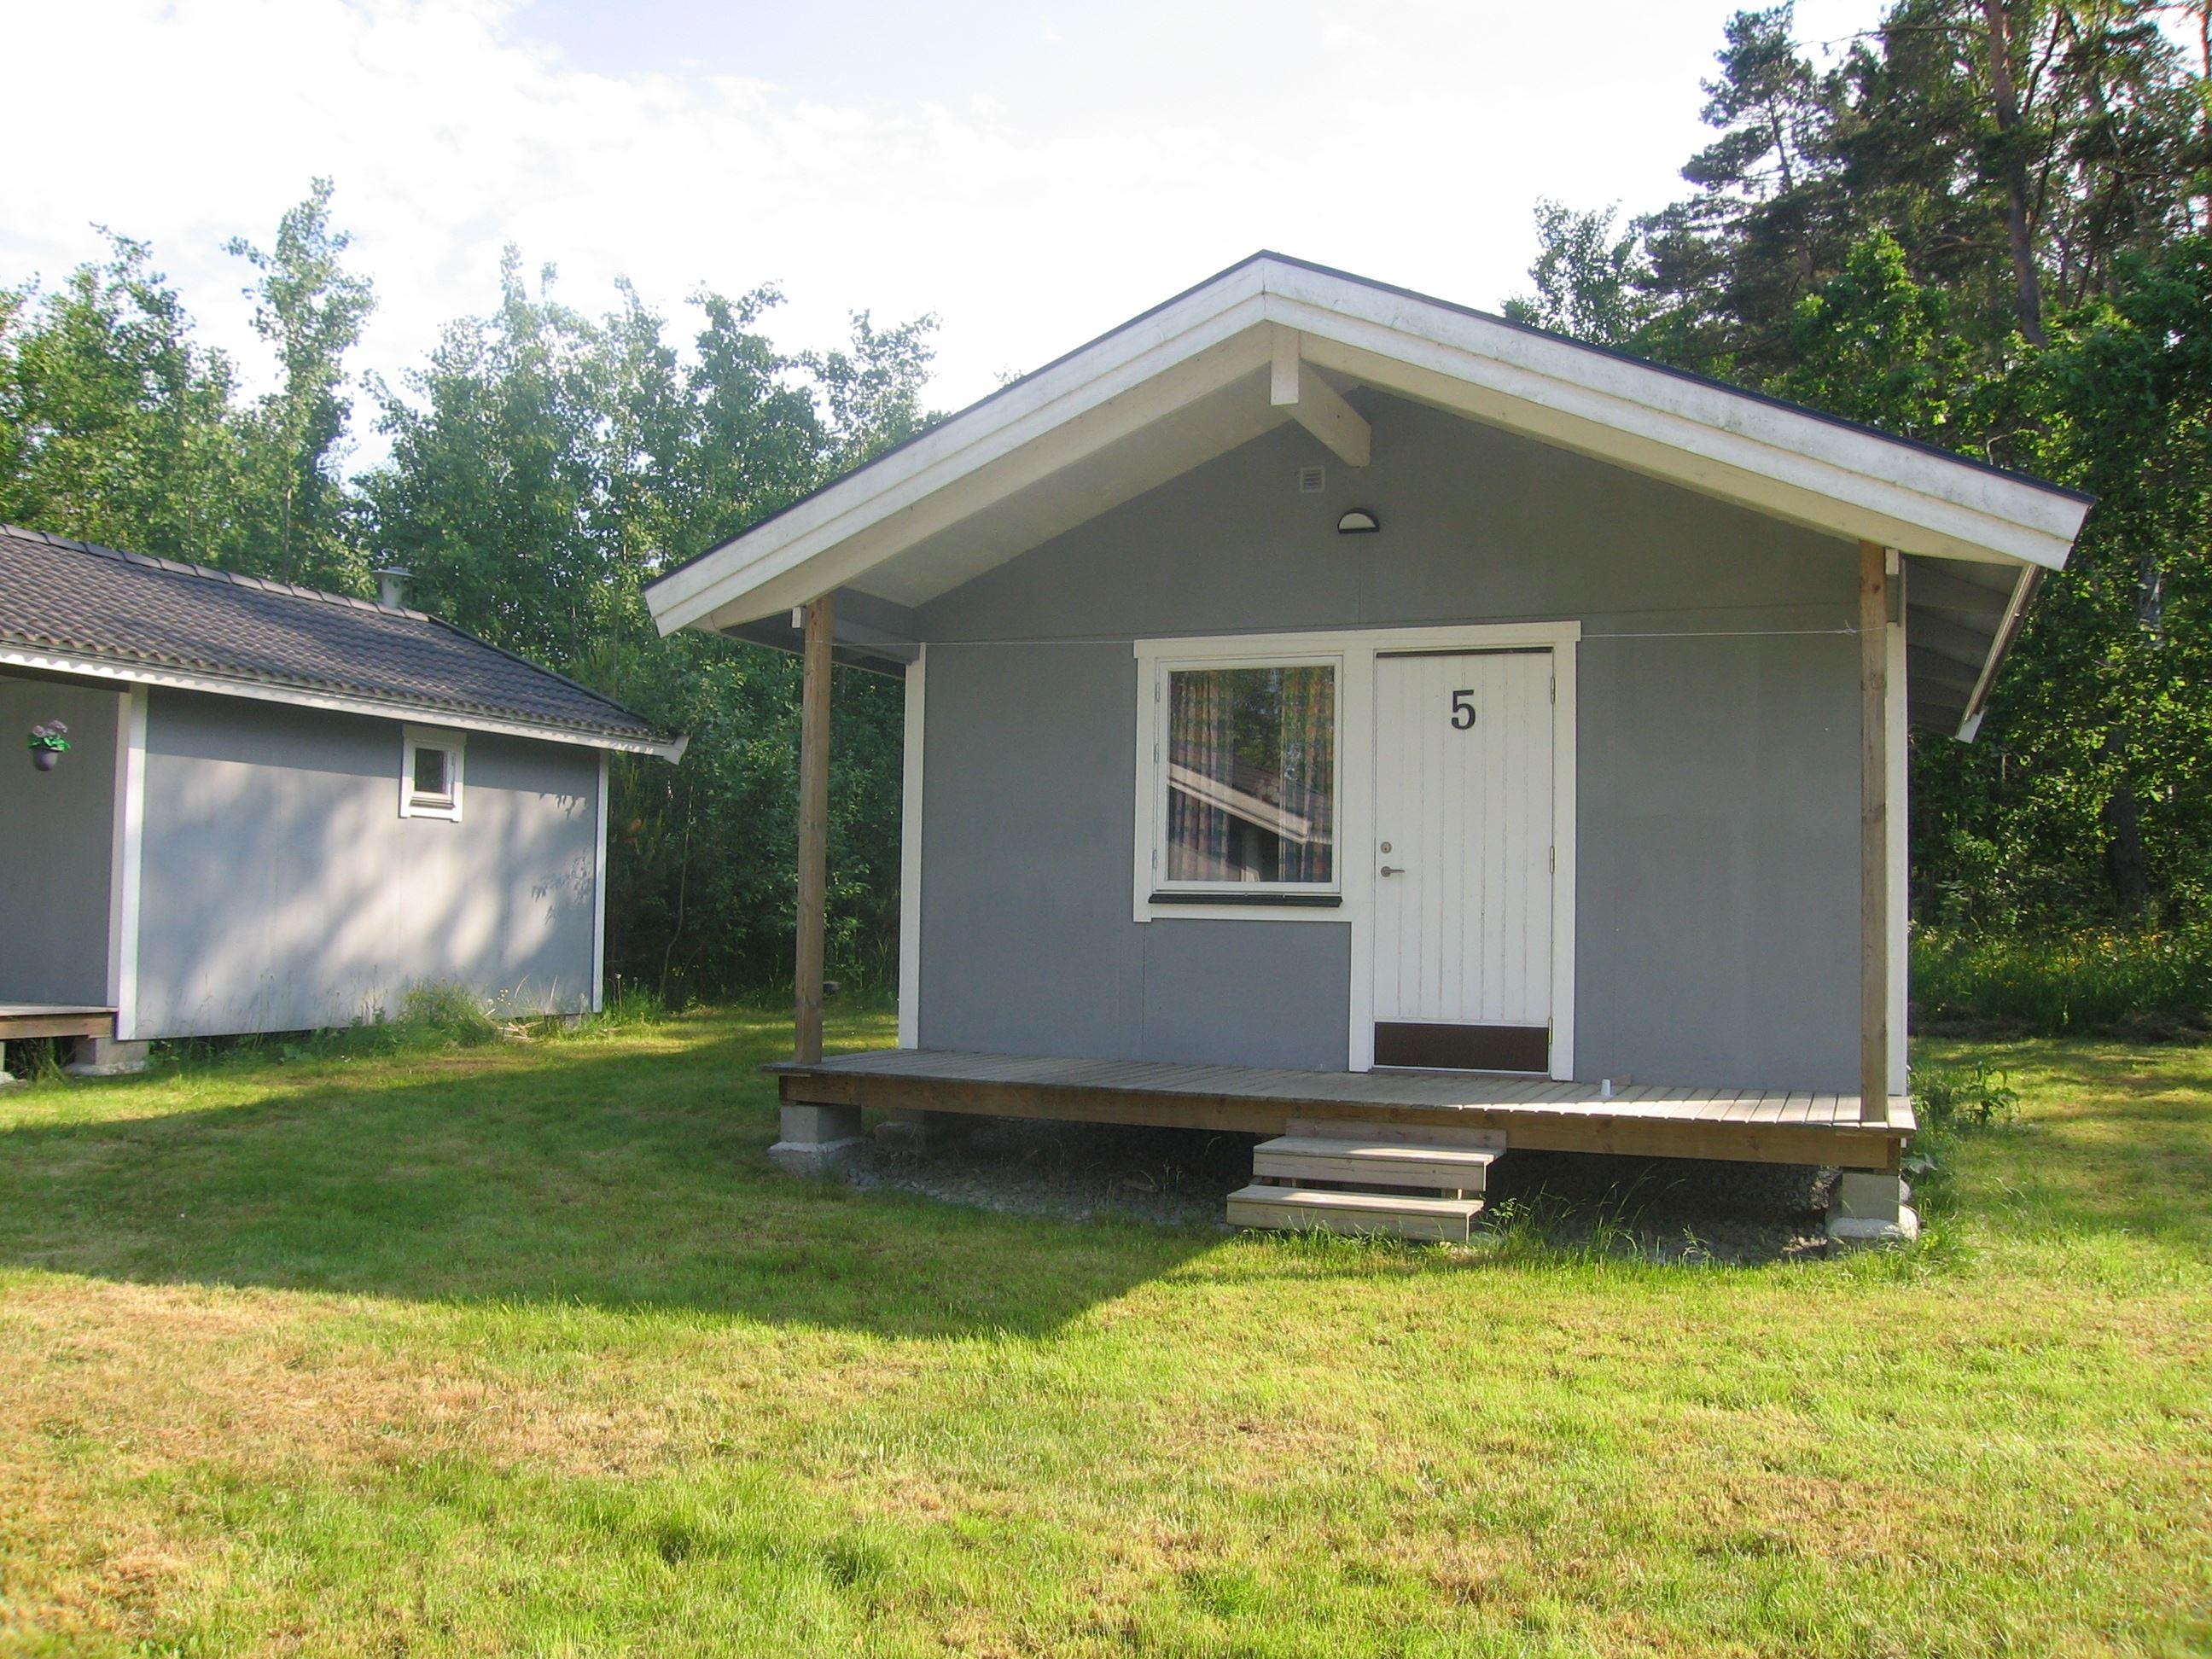 Grankulla B&B & Cottages